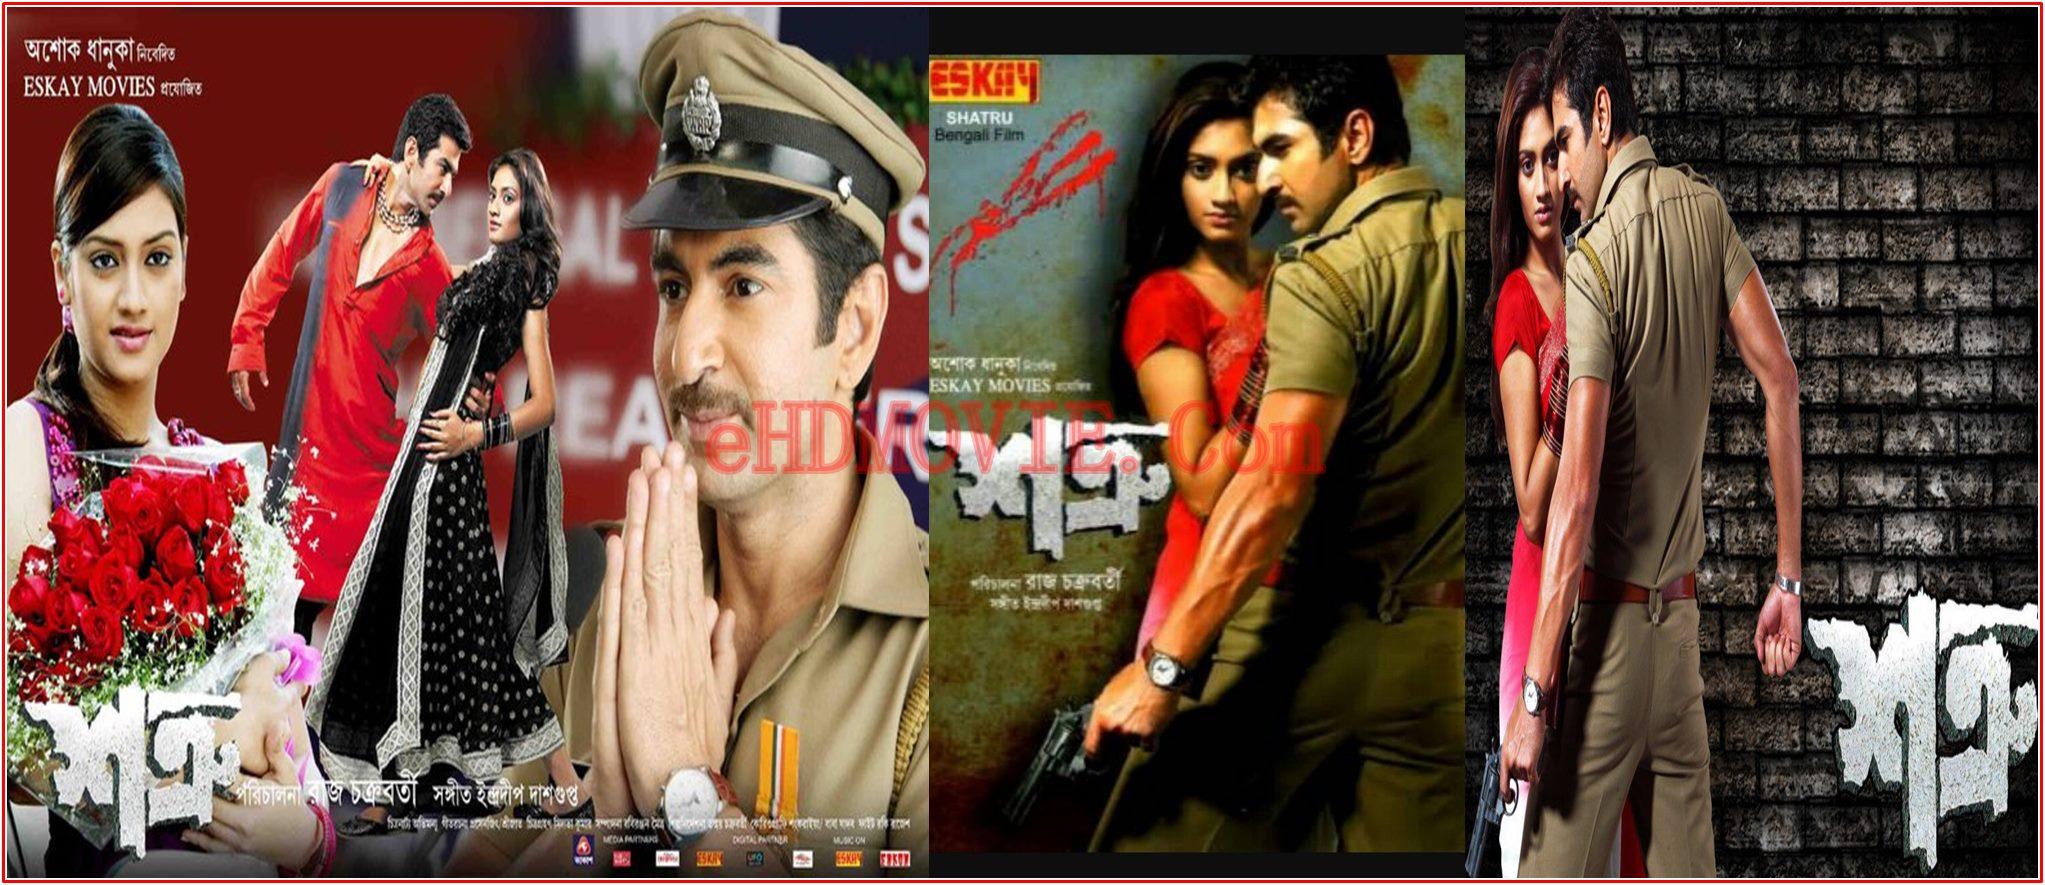 Shatru 2011 Bengali Full Movie Original 480p – 720p ORG WEB-DL 550MB – 2GB